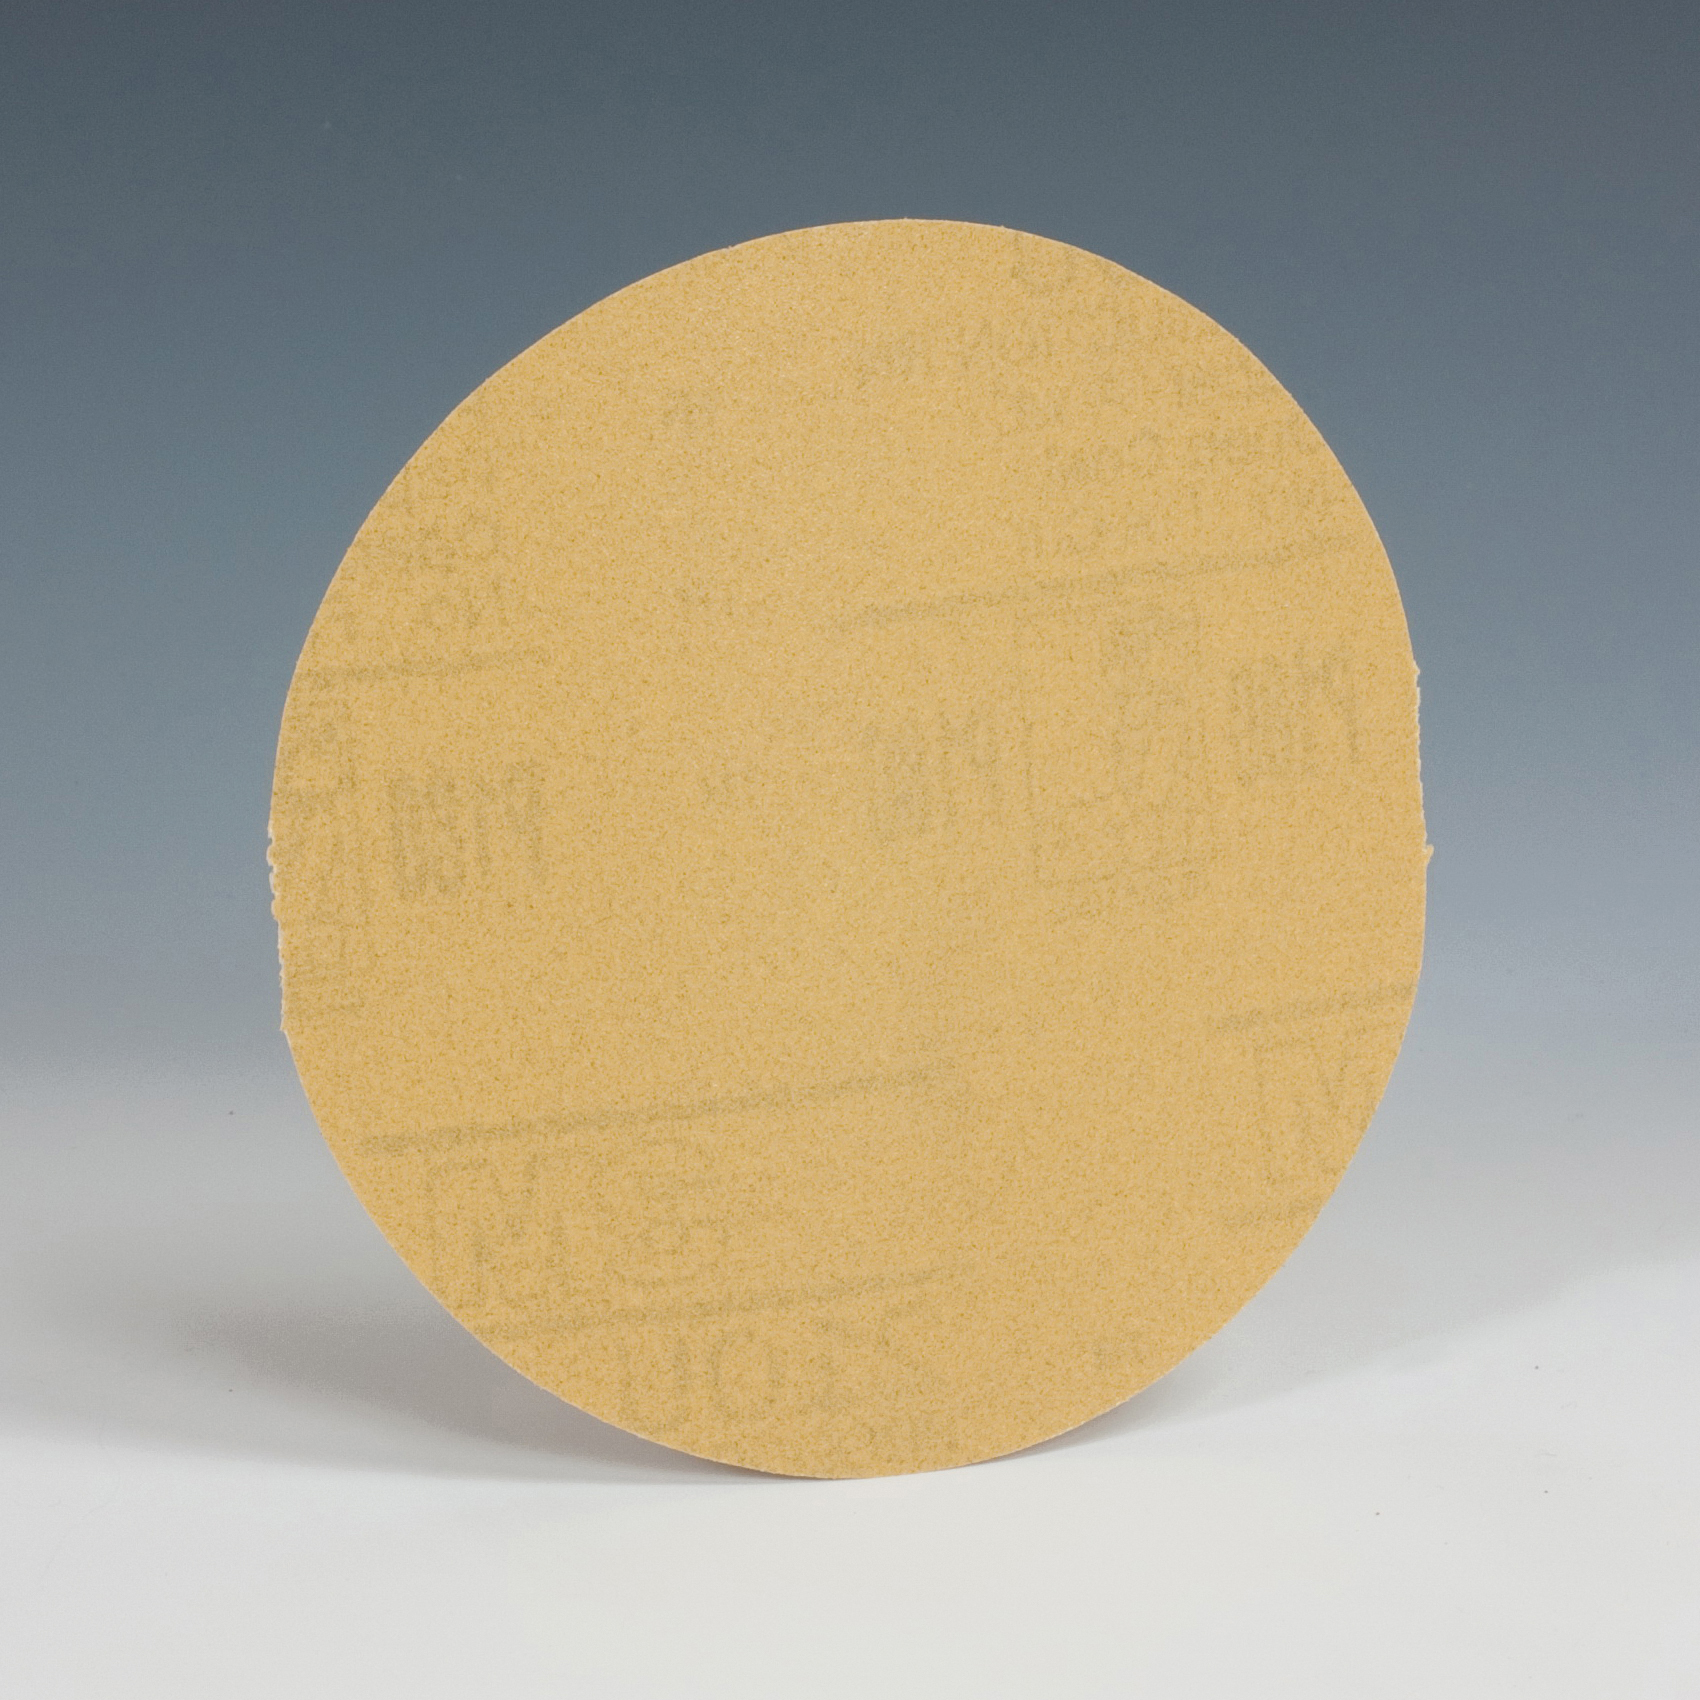 3M™ Hookit™ 051144-84896 210U Open Coated Abrasive Abrasive Disc, 5 in Dia Disc, P400 Grit, Extra Fine Grade, Aluminum Oxide Abrasive, Paper Backing